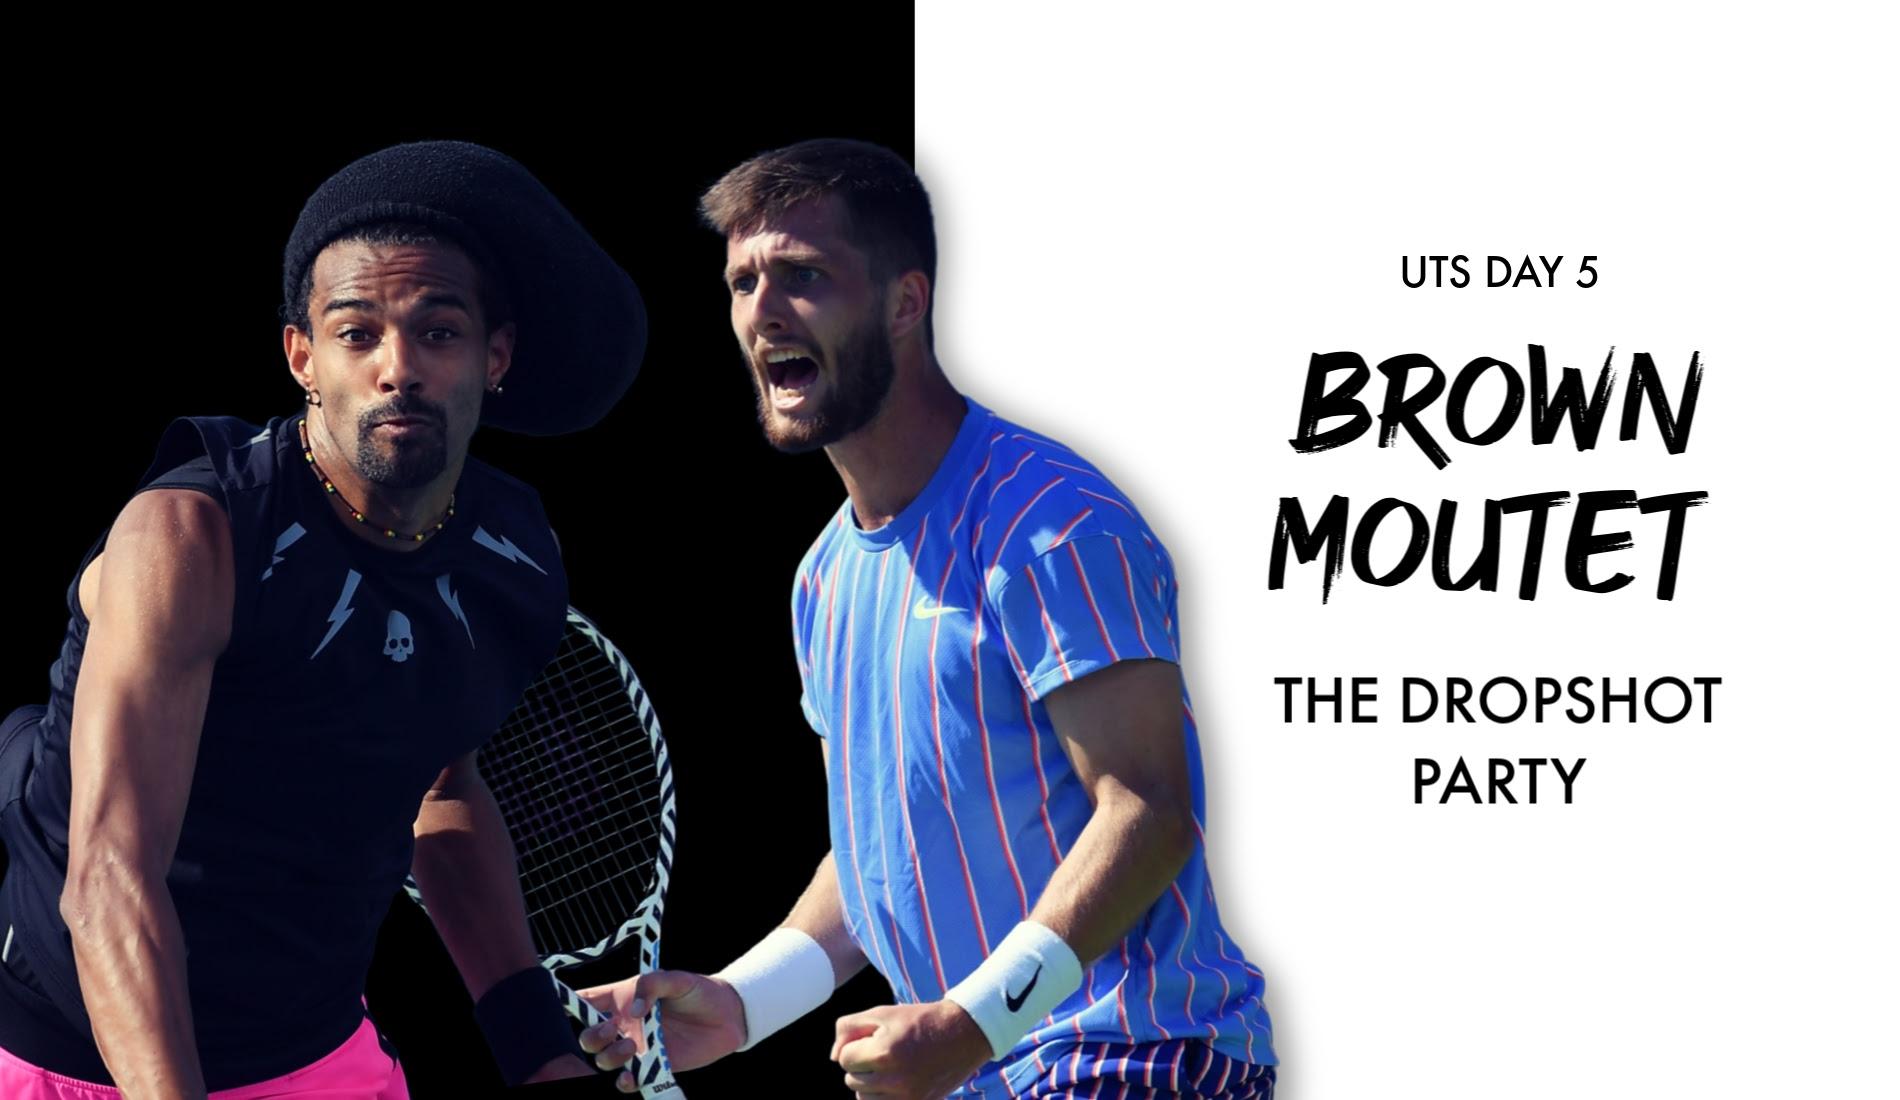 UTS1 - Day 5 Preview: Dustin Brown vs Corentin Moutet